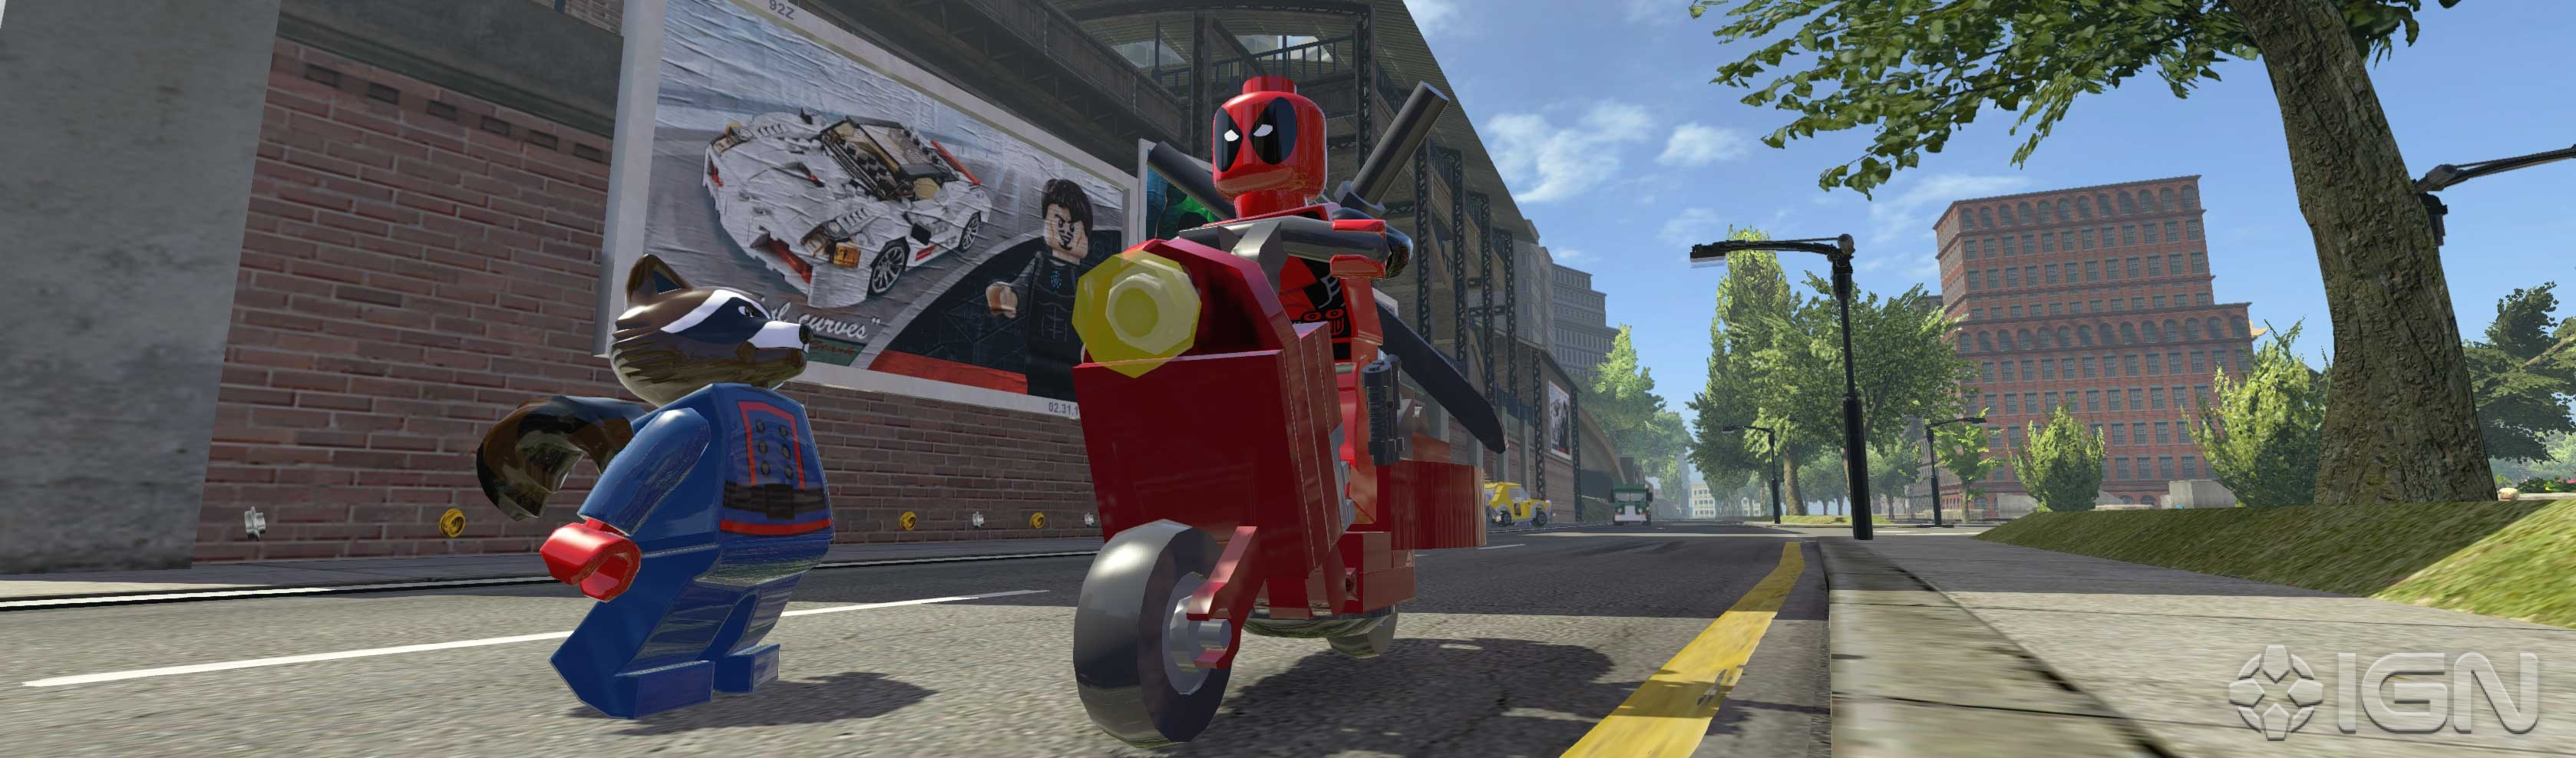 Lego Marvel Super Heroes Vehicles Revealed Fbtb